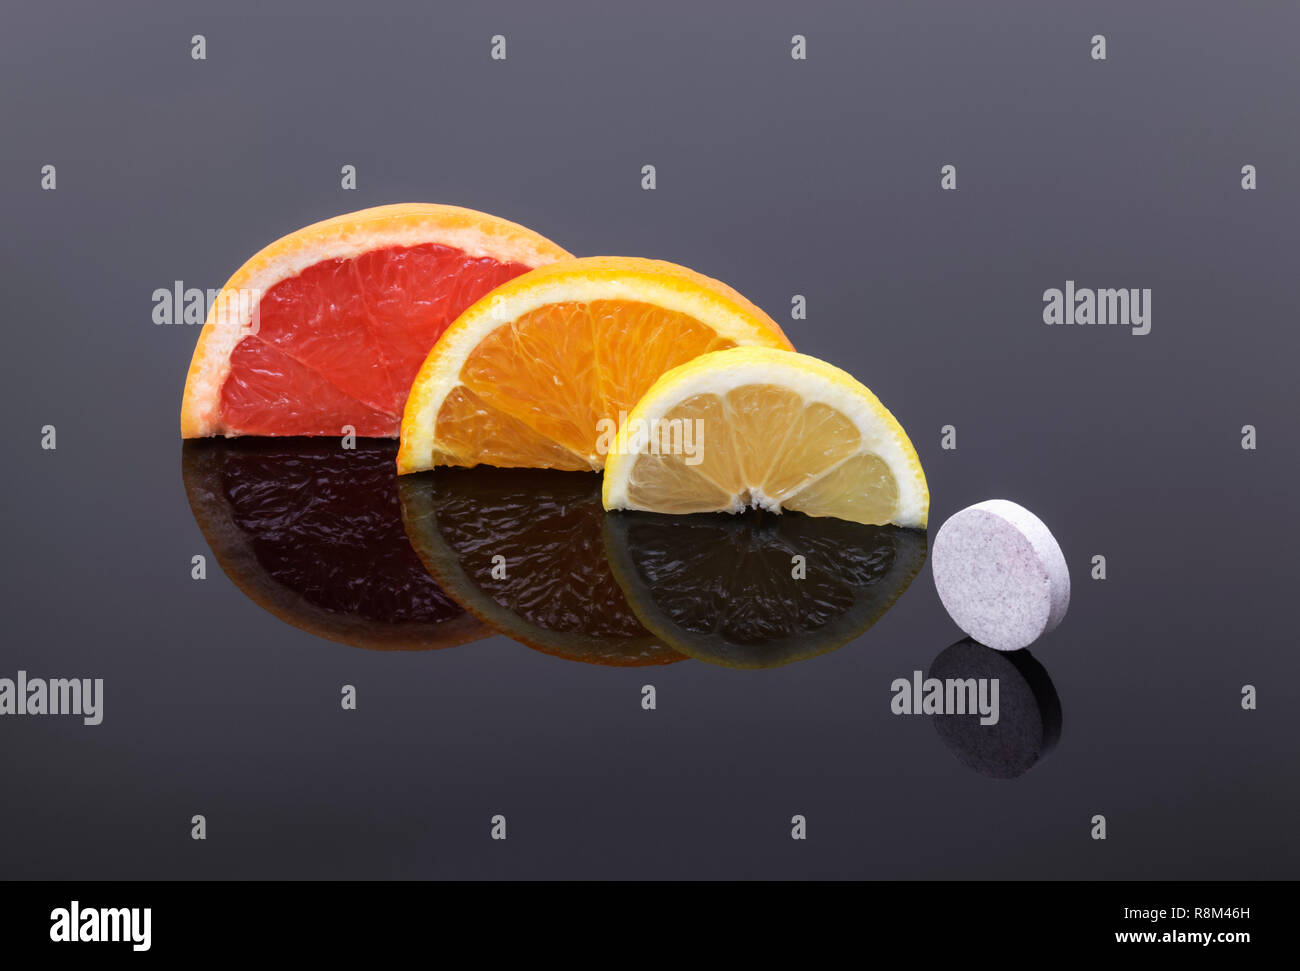 Grapefruit ,Orange and Lemon slices and a vitamin tablet .Natural vitamin C versus synthetic vitamins. - Stock Image